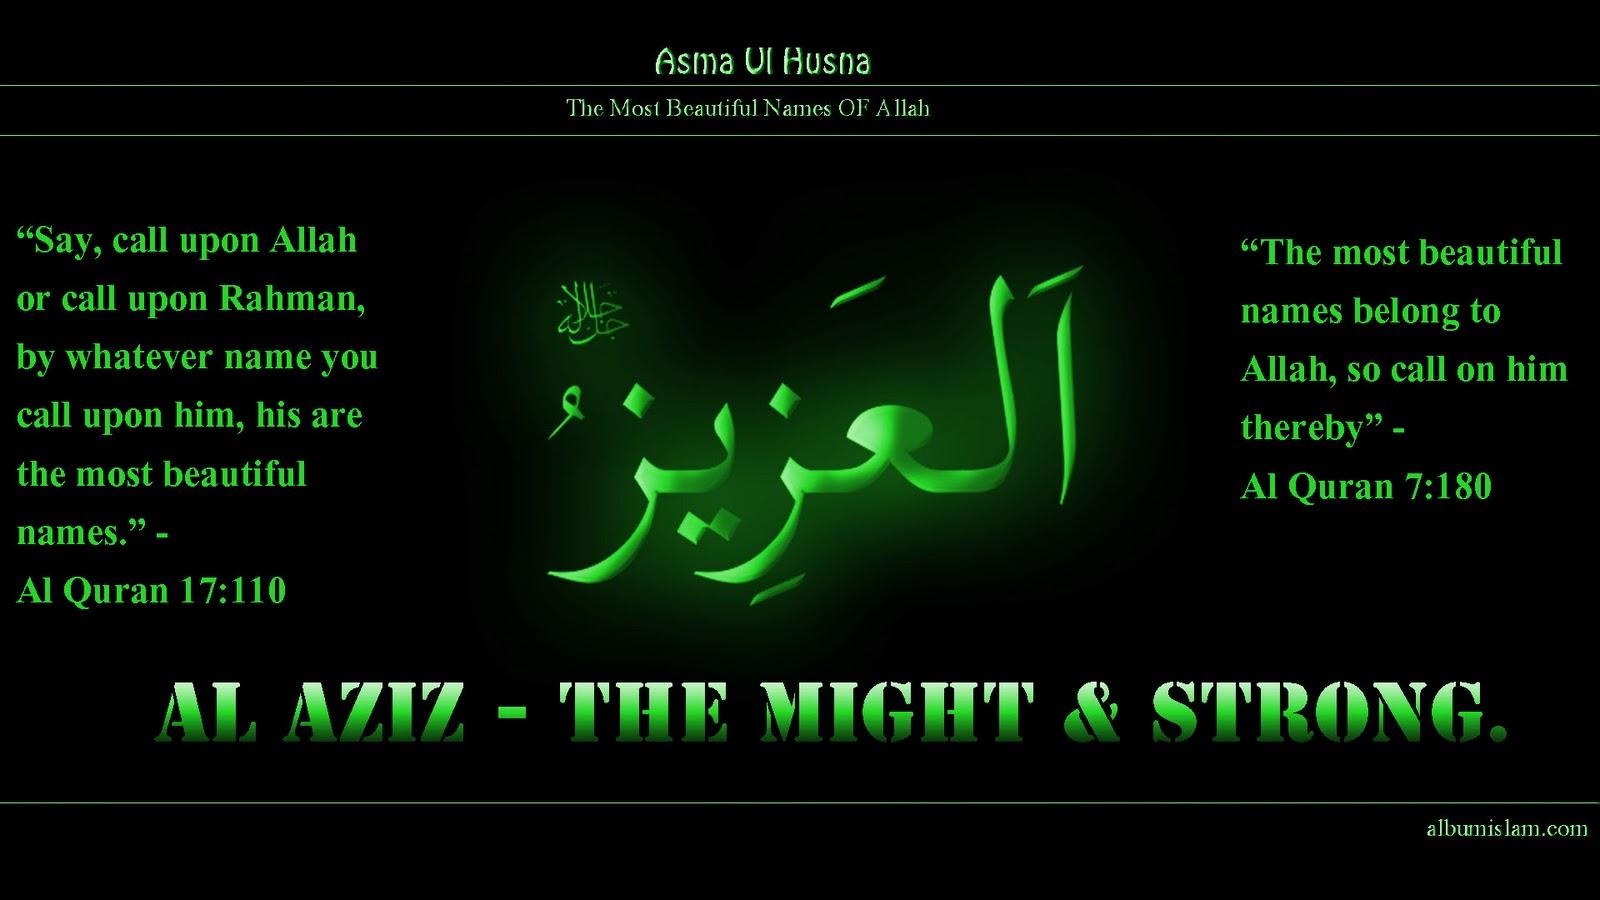 Masha Allah Hd Wallpaper Album Islam Al Aziz